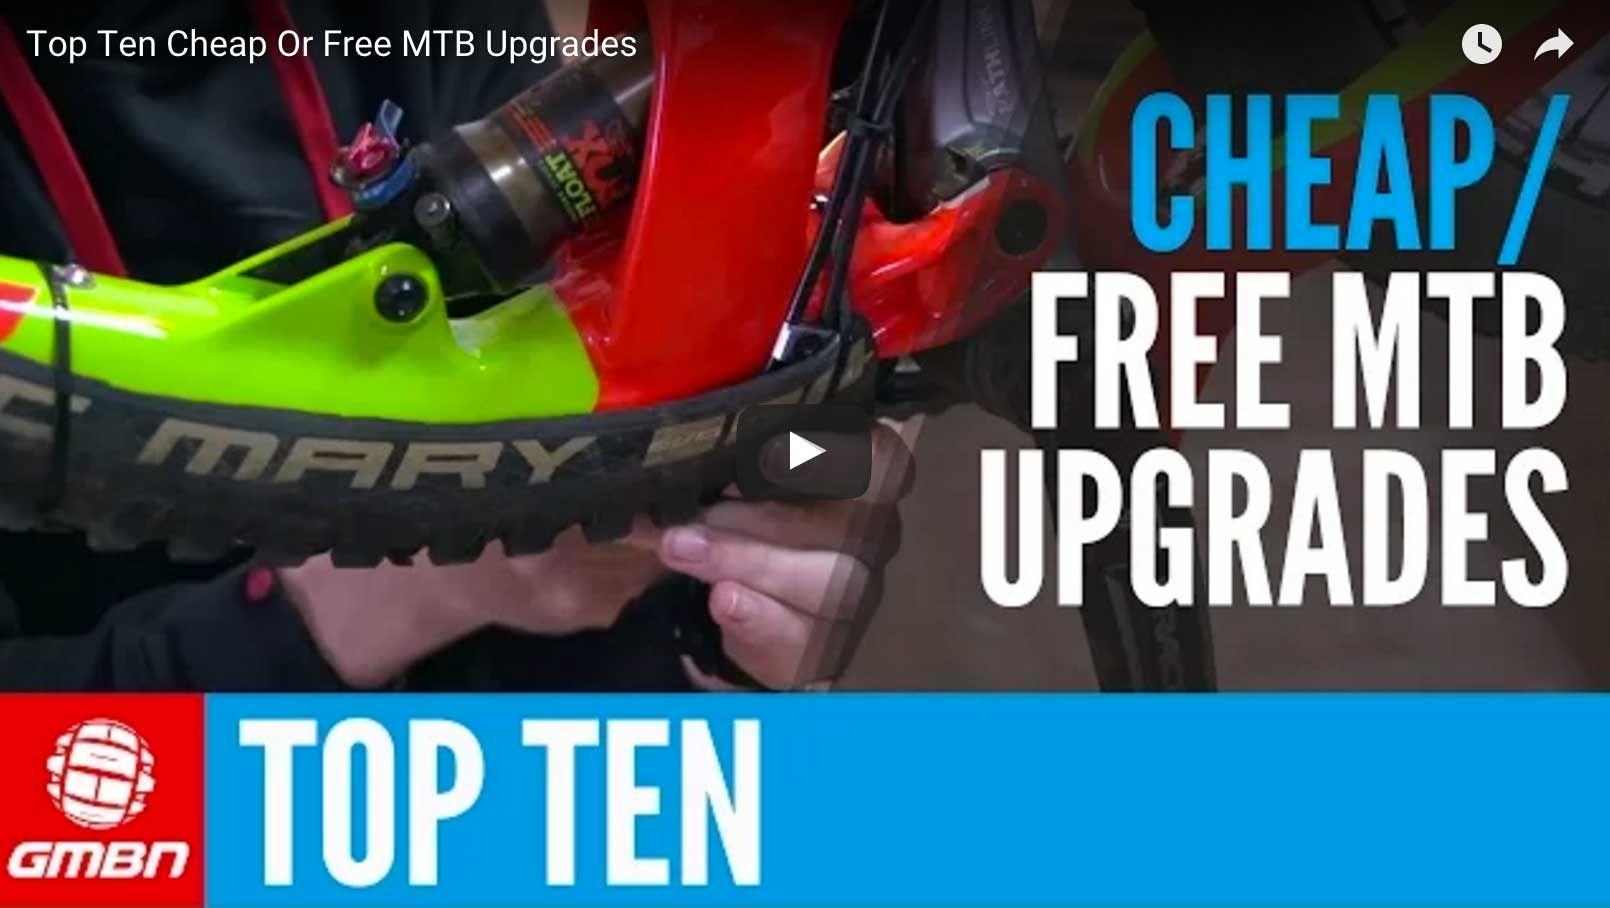 Top 10 Diy Mountain Bike Hacks Upgrades Bike Hacks Mountain